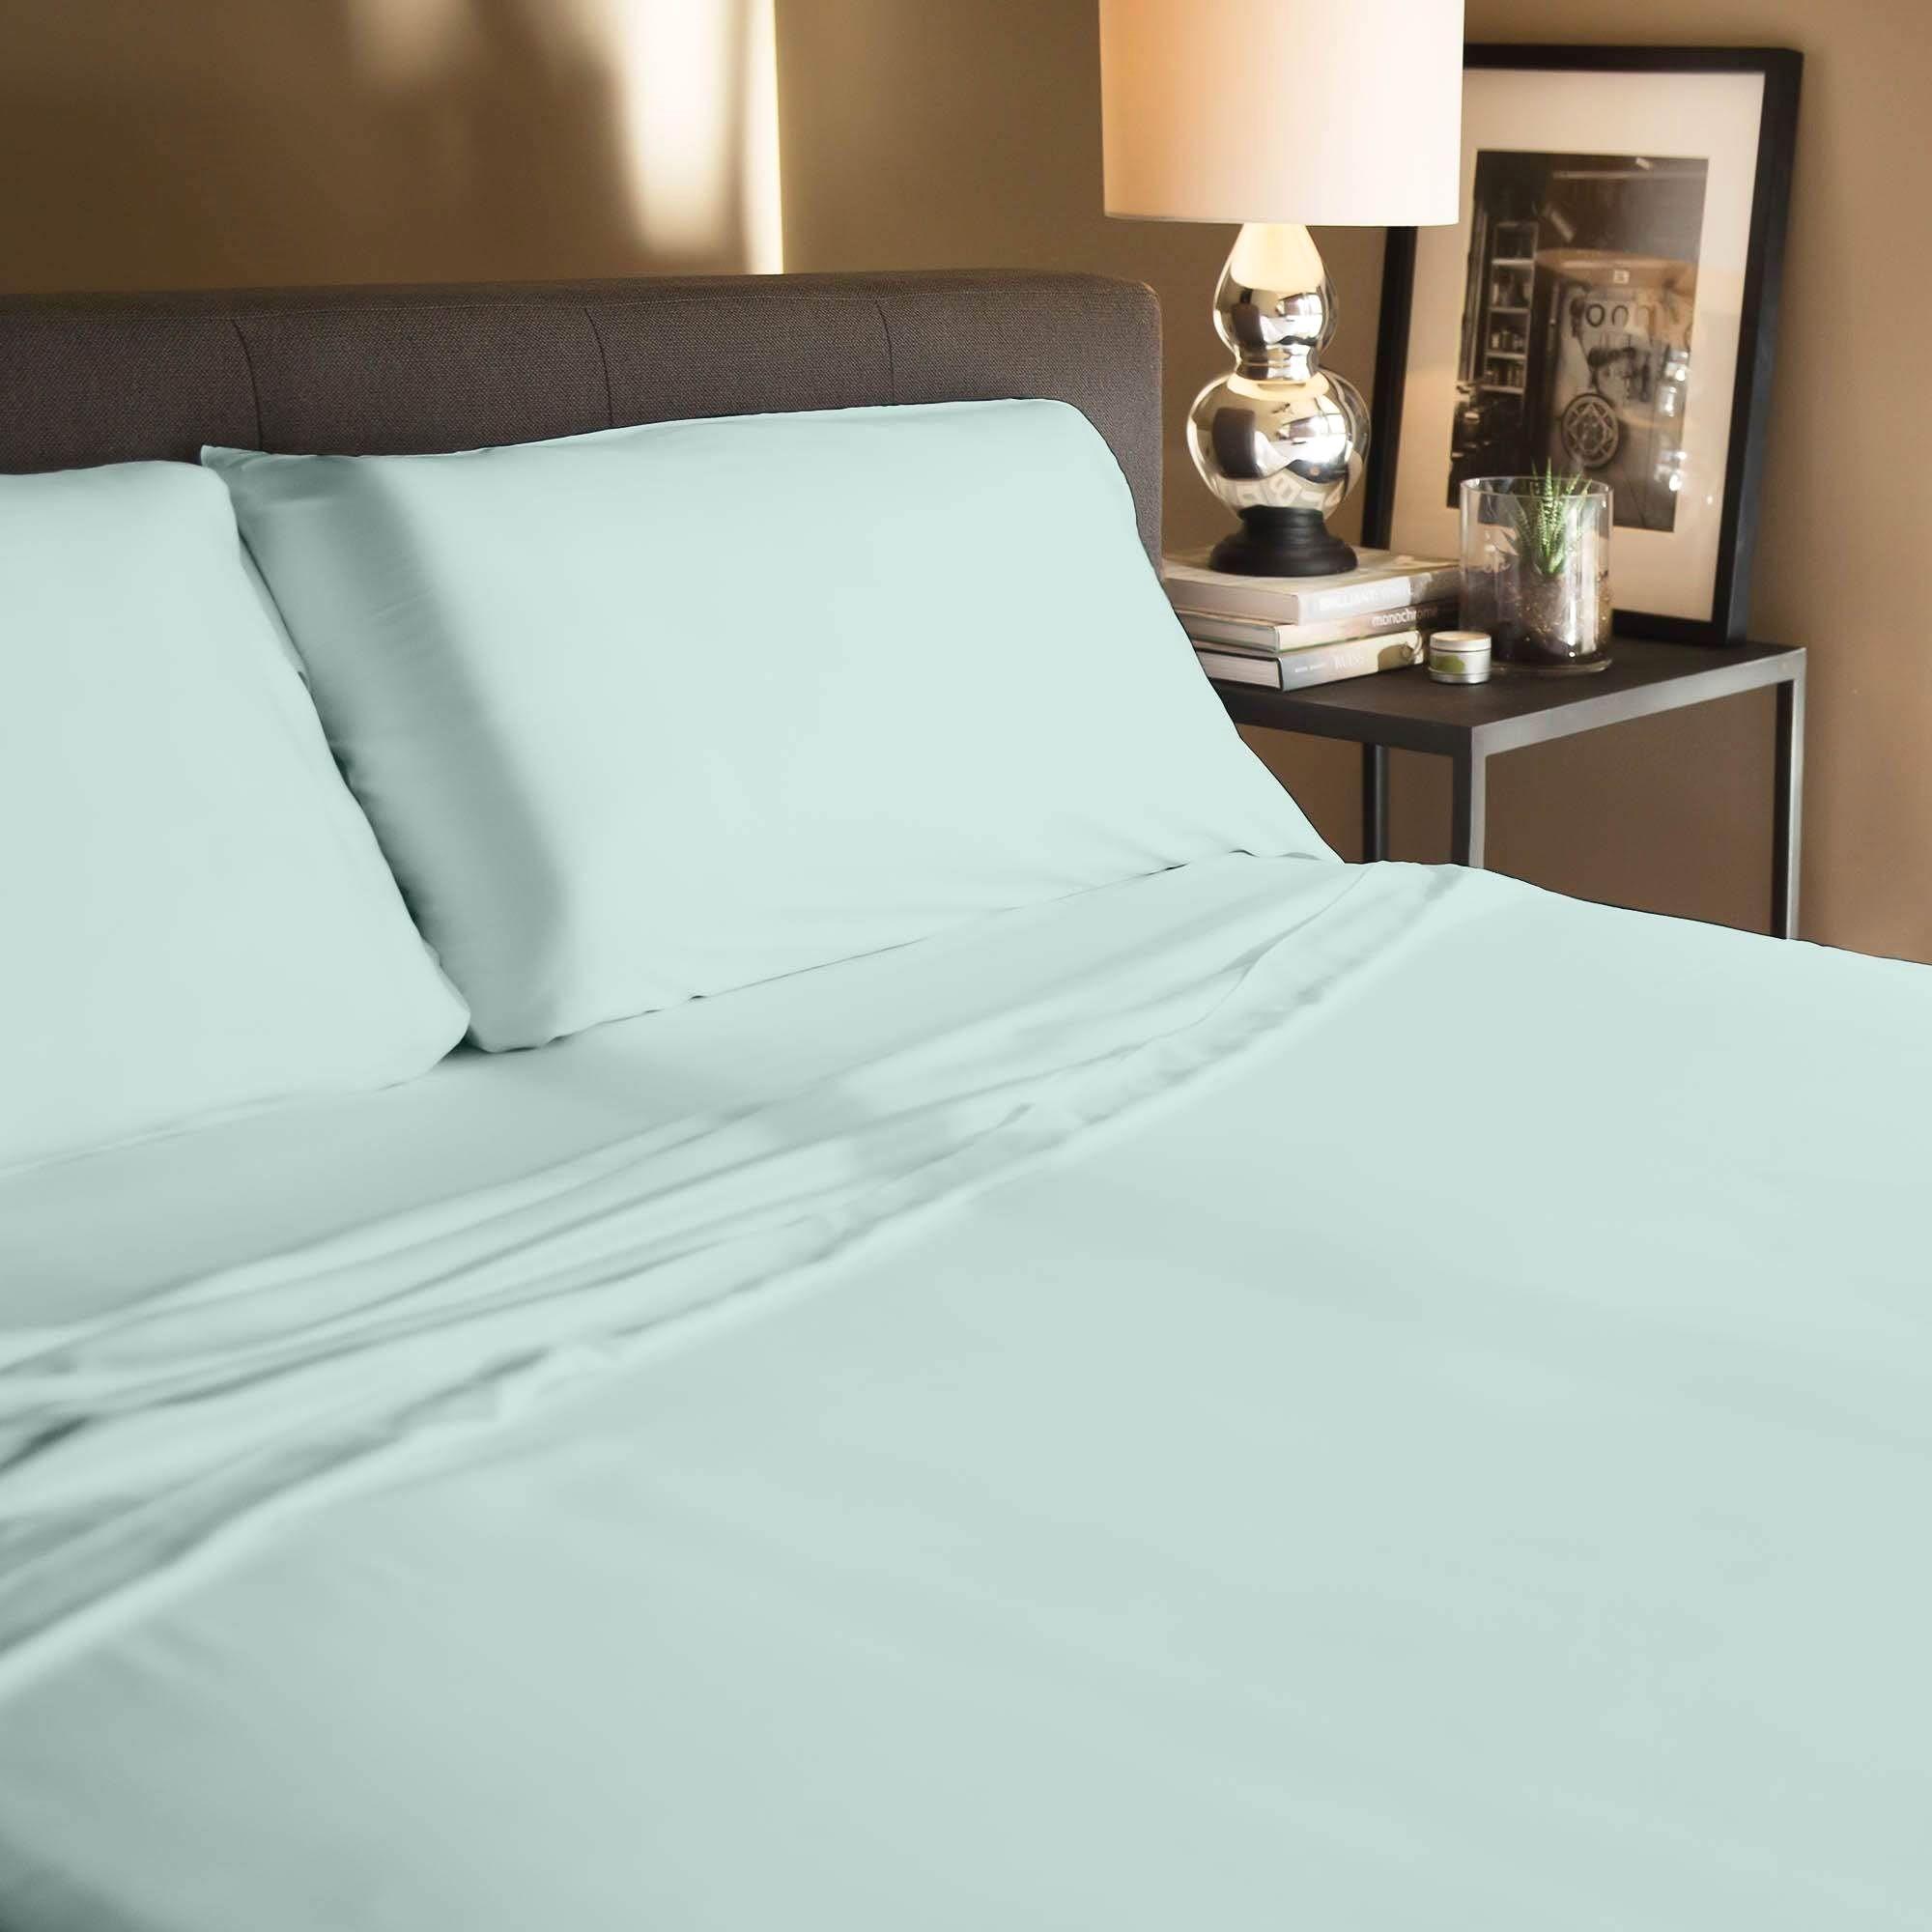 Natural Tencel Sheet Sets Best Pillows For Sleeping Natural Bed